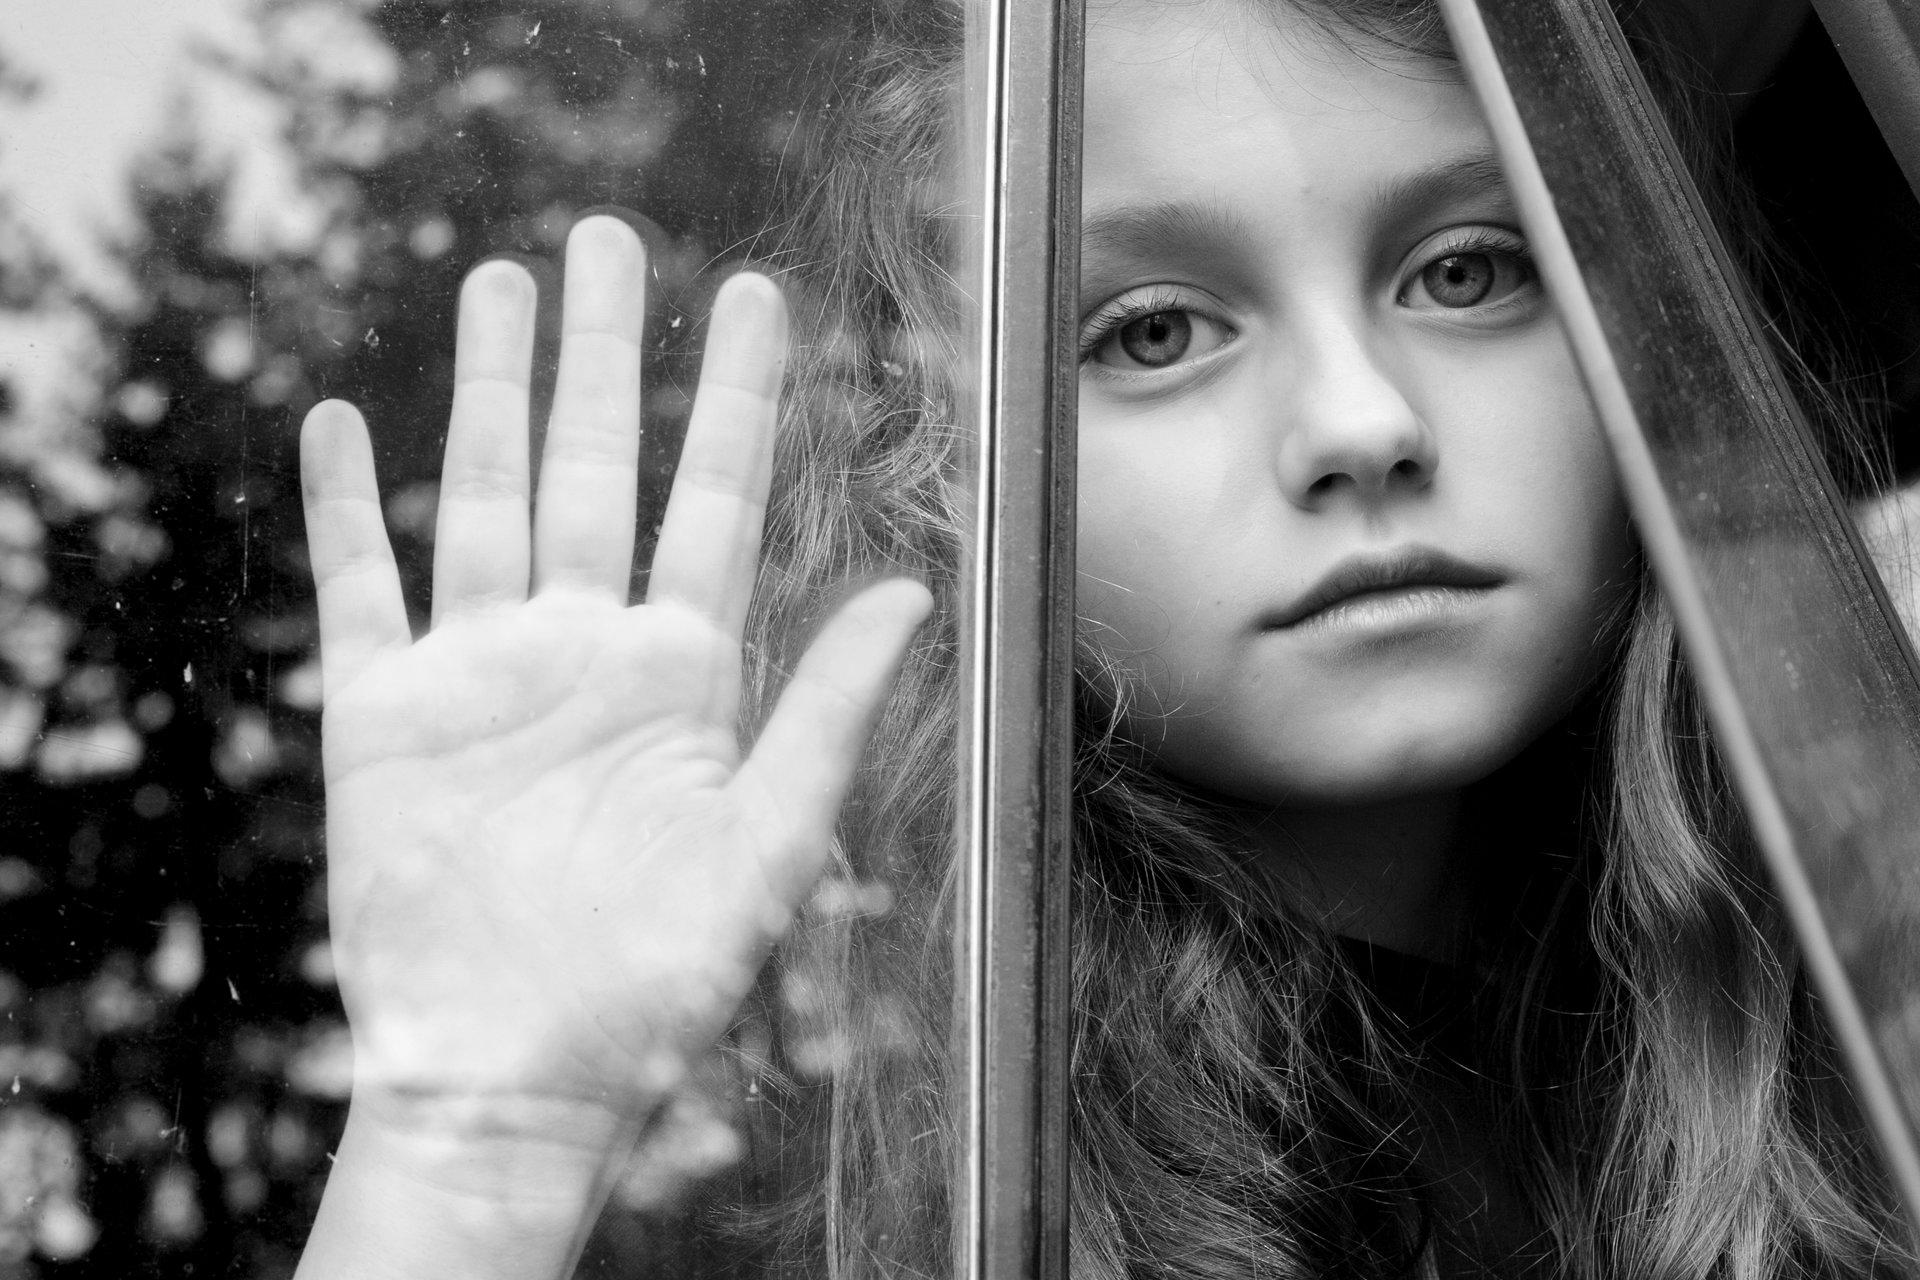 Photo in Portrait | Author Evelin Dobrev - Evko | PHOTO FORUM